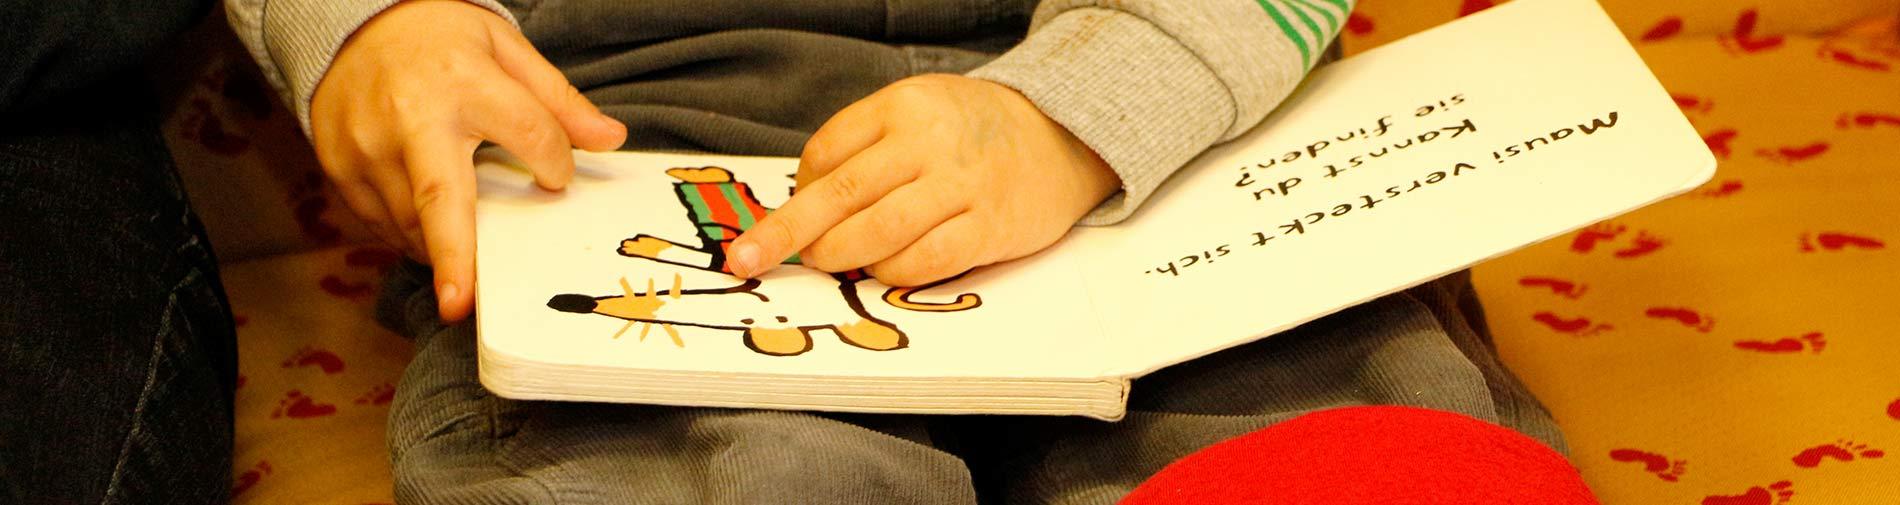 Kontakt zum Förderverein des ev. Kindergarten Langballig